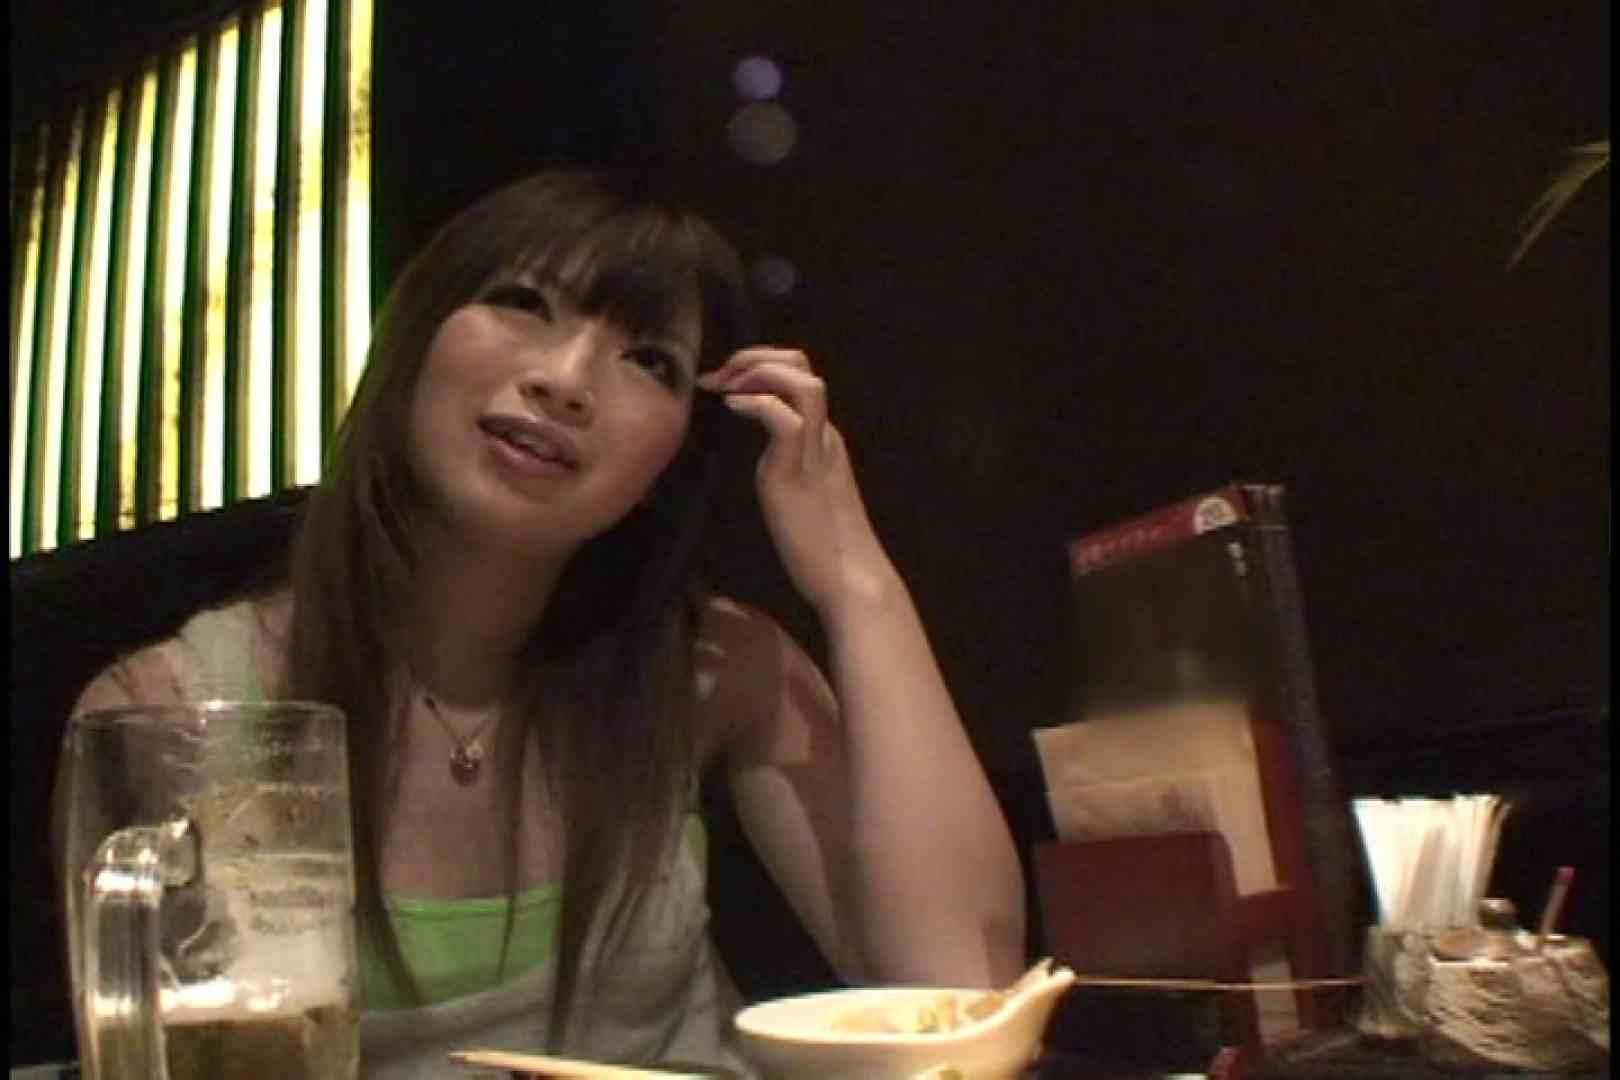 JDハンター全国ツアー vol.039 前編 女子大生のエロ動画 | 0  81PIX 29